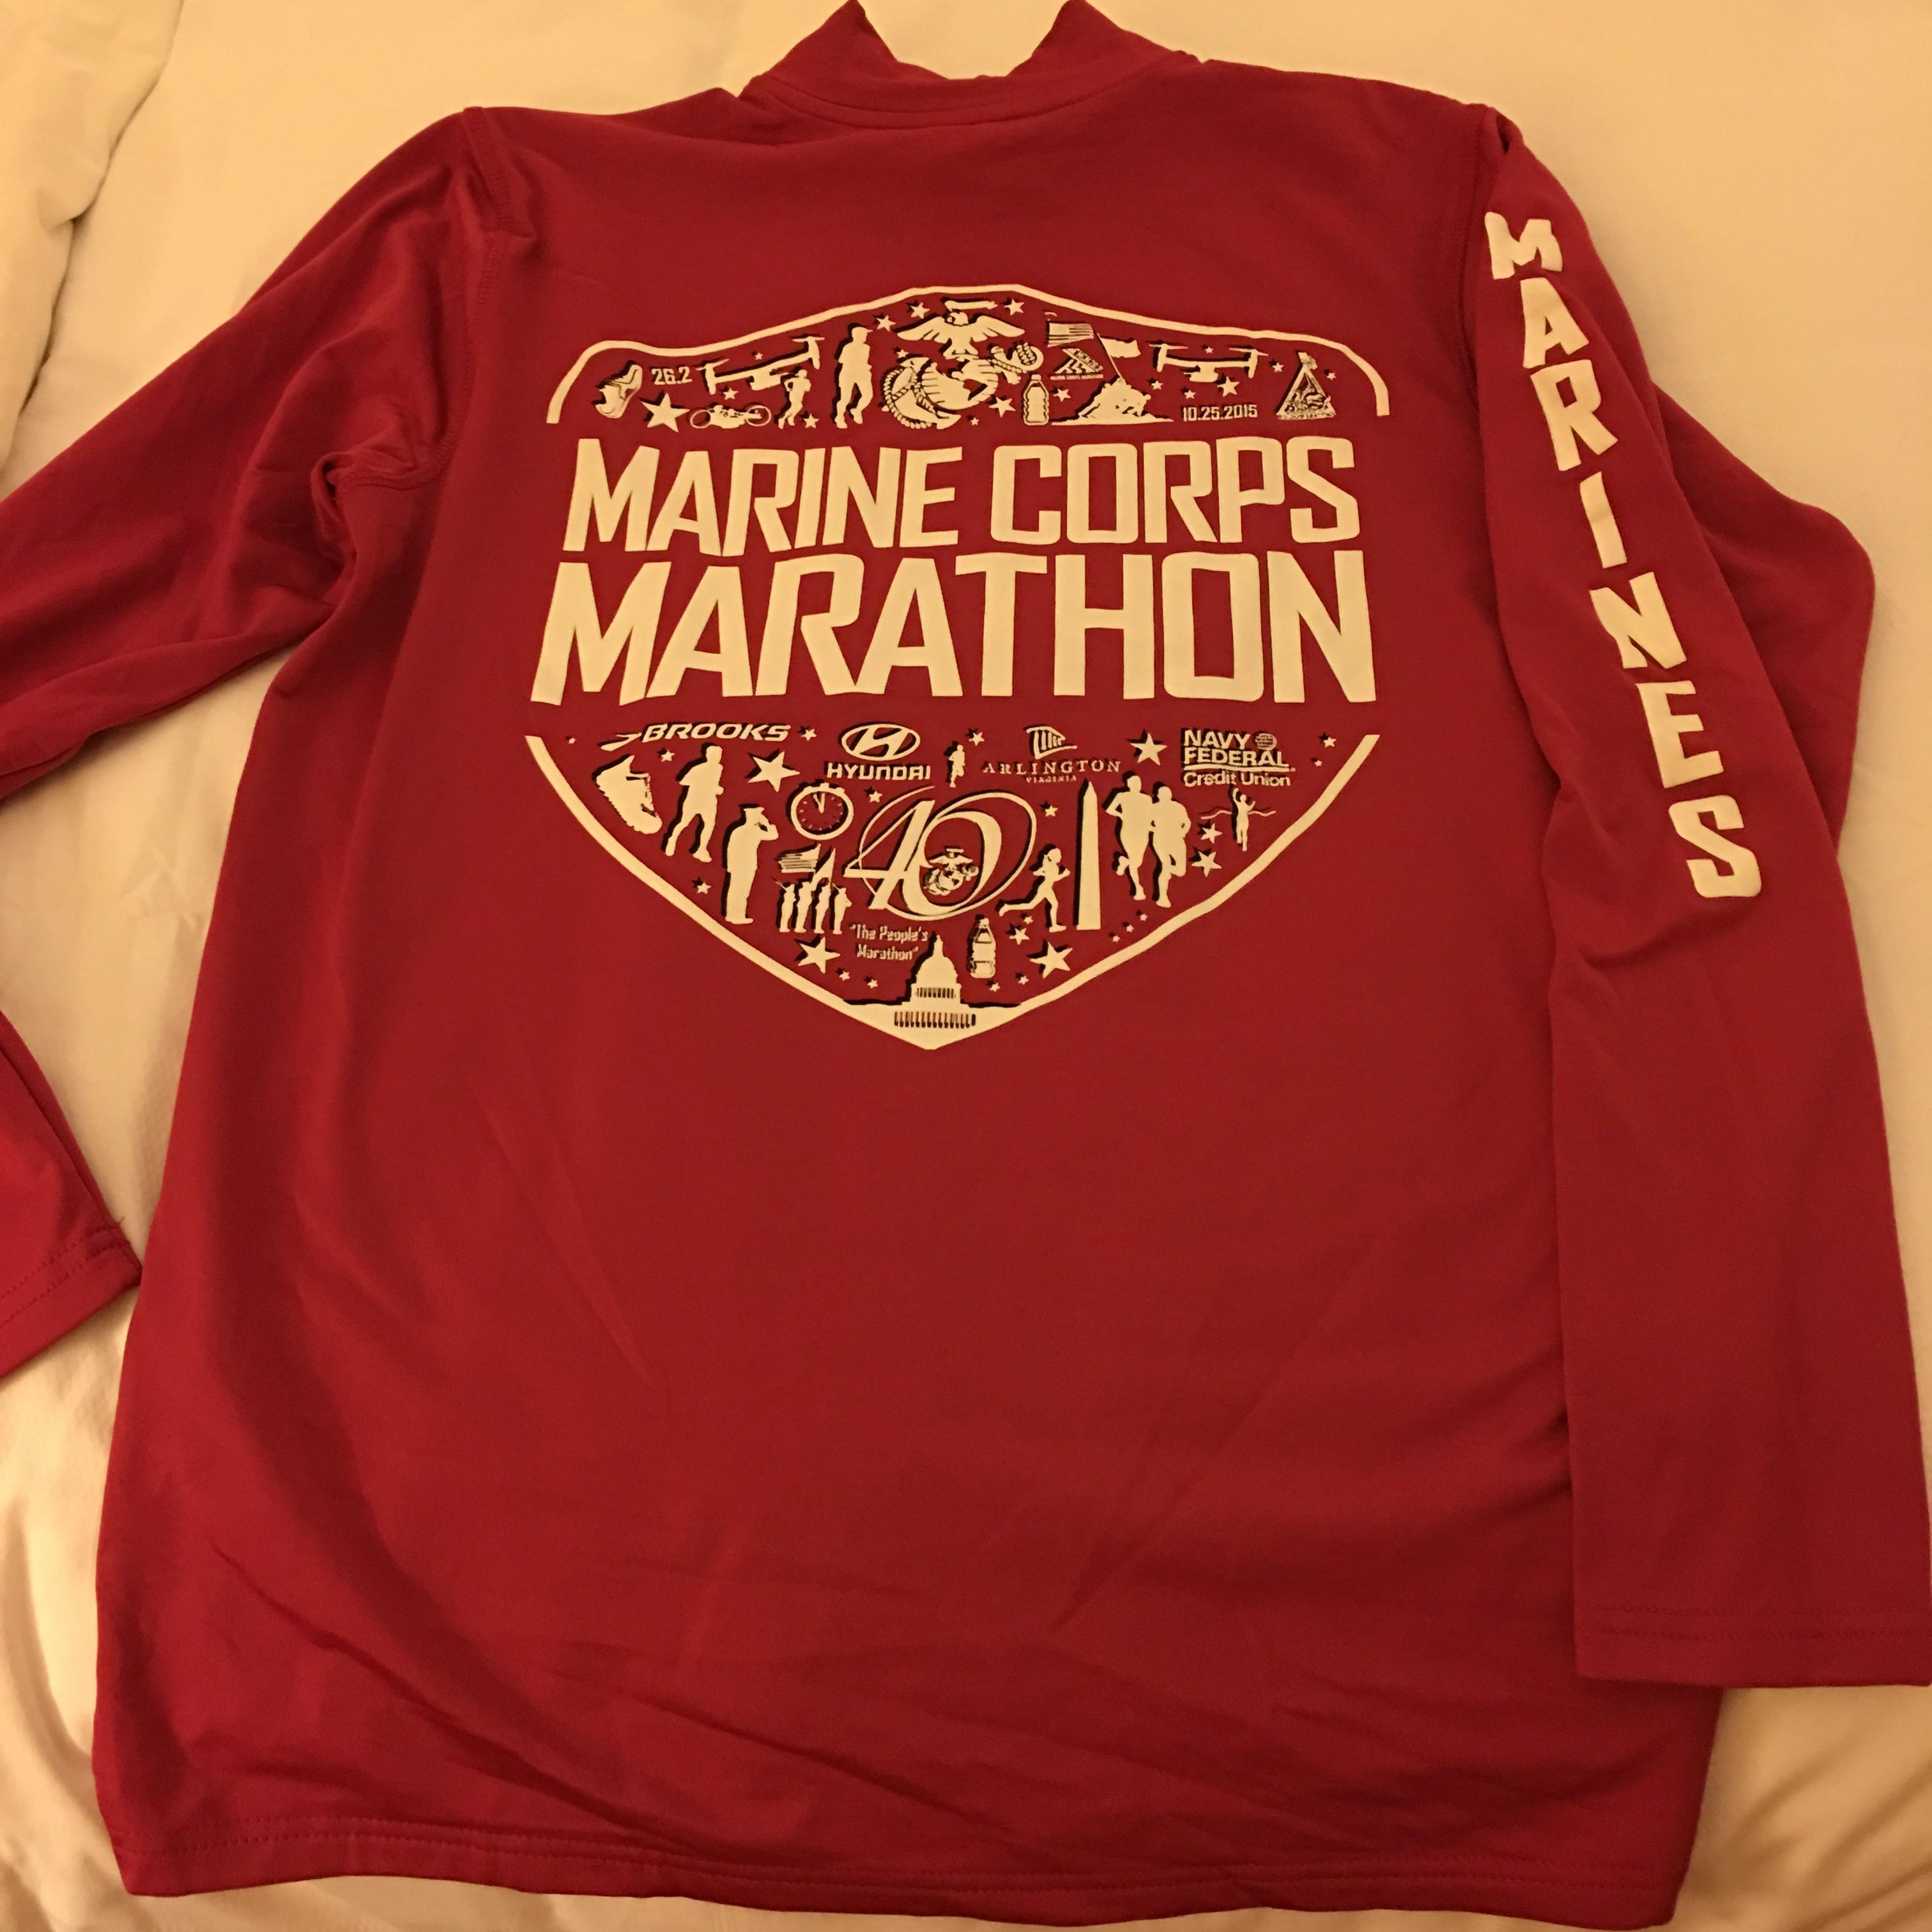 40th marine corp marathon expo wife mother runner for Marine corps marathon shirt 2017